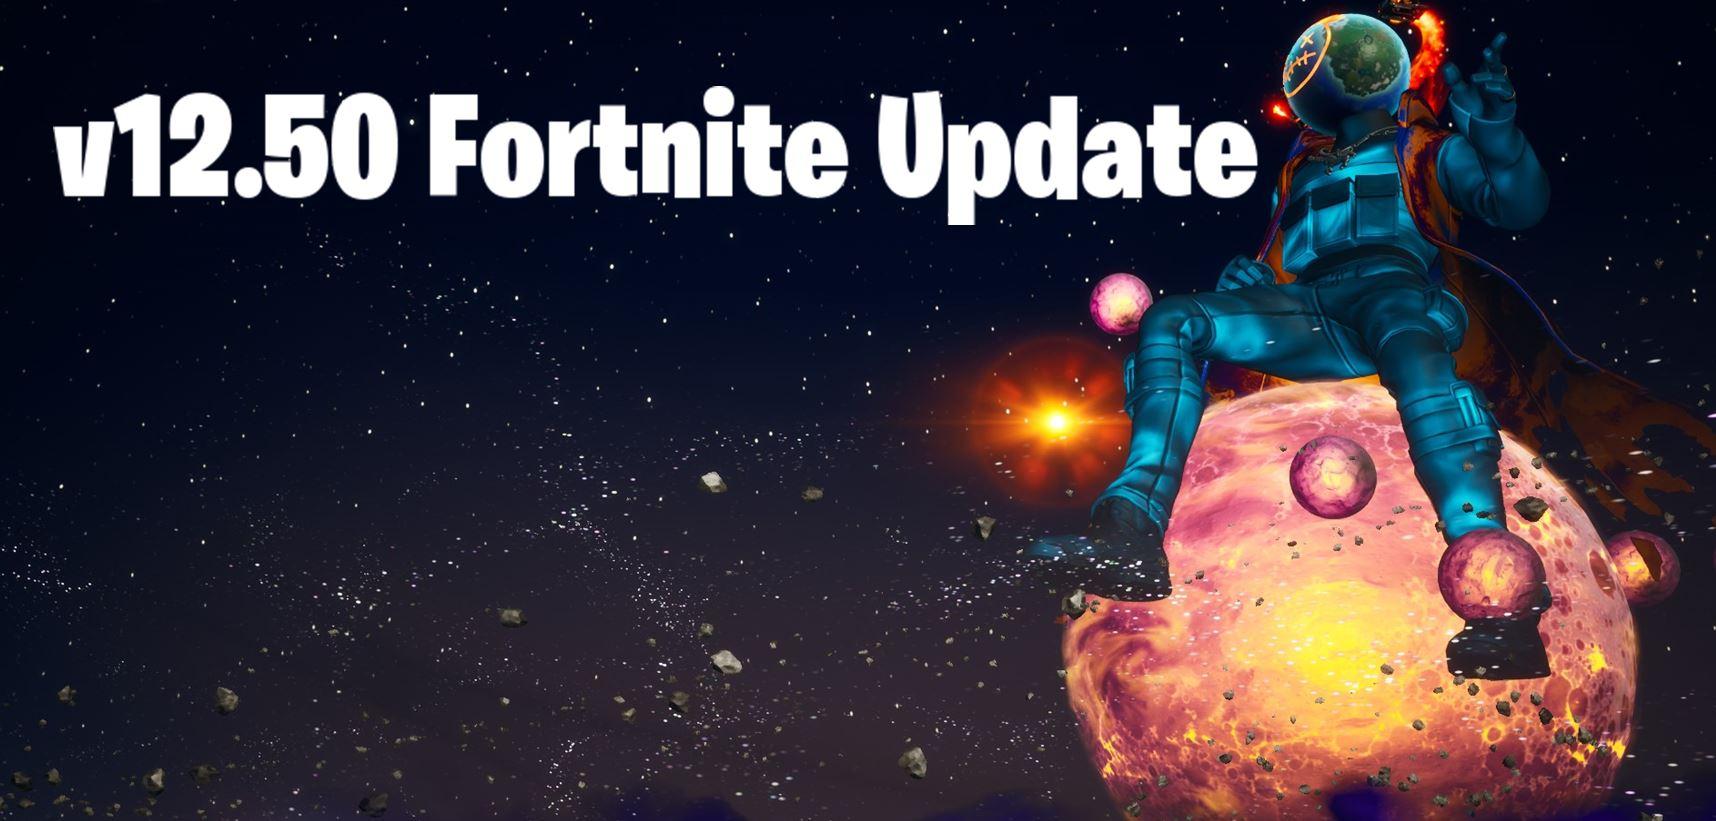 New Fortnite Update v12.50